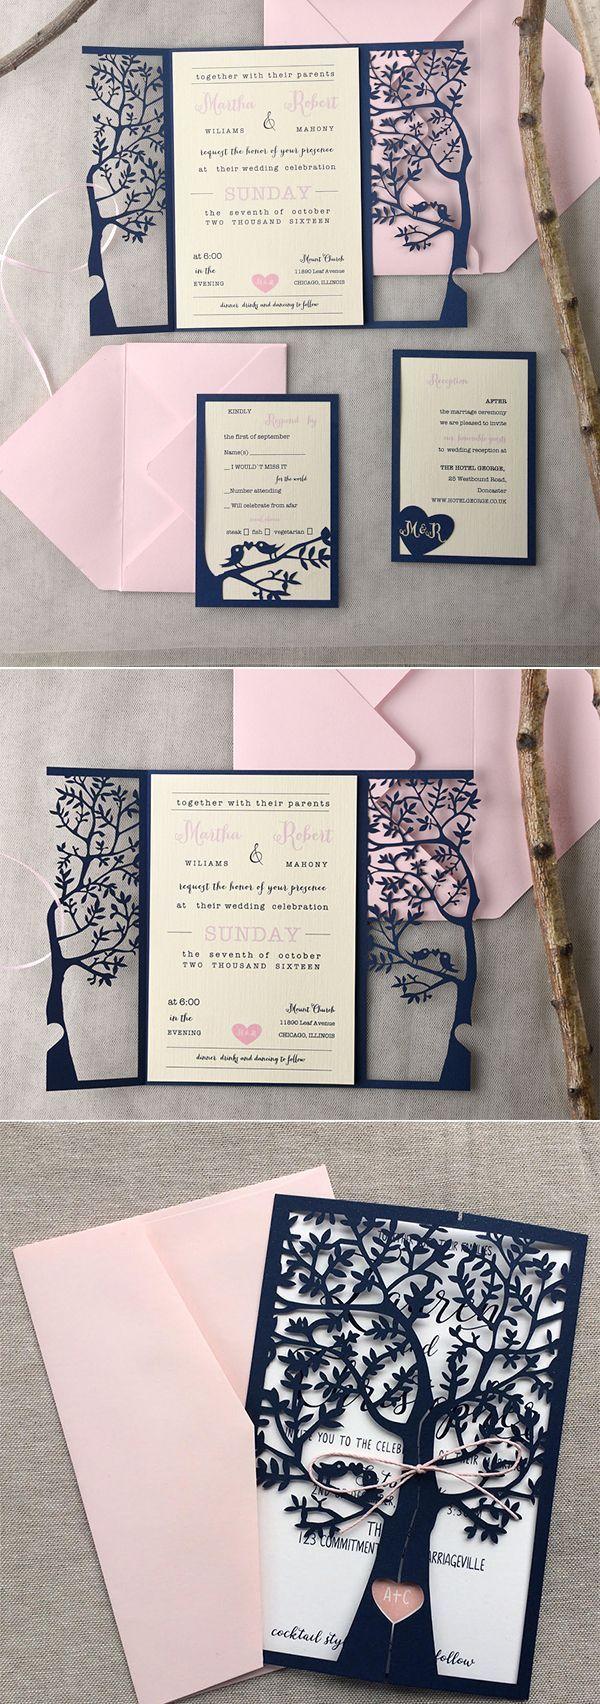 Best 25+ Cheap wedding invitations ideas on Pinterest | Cheap ...